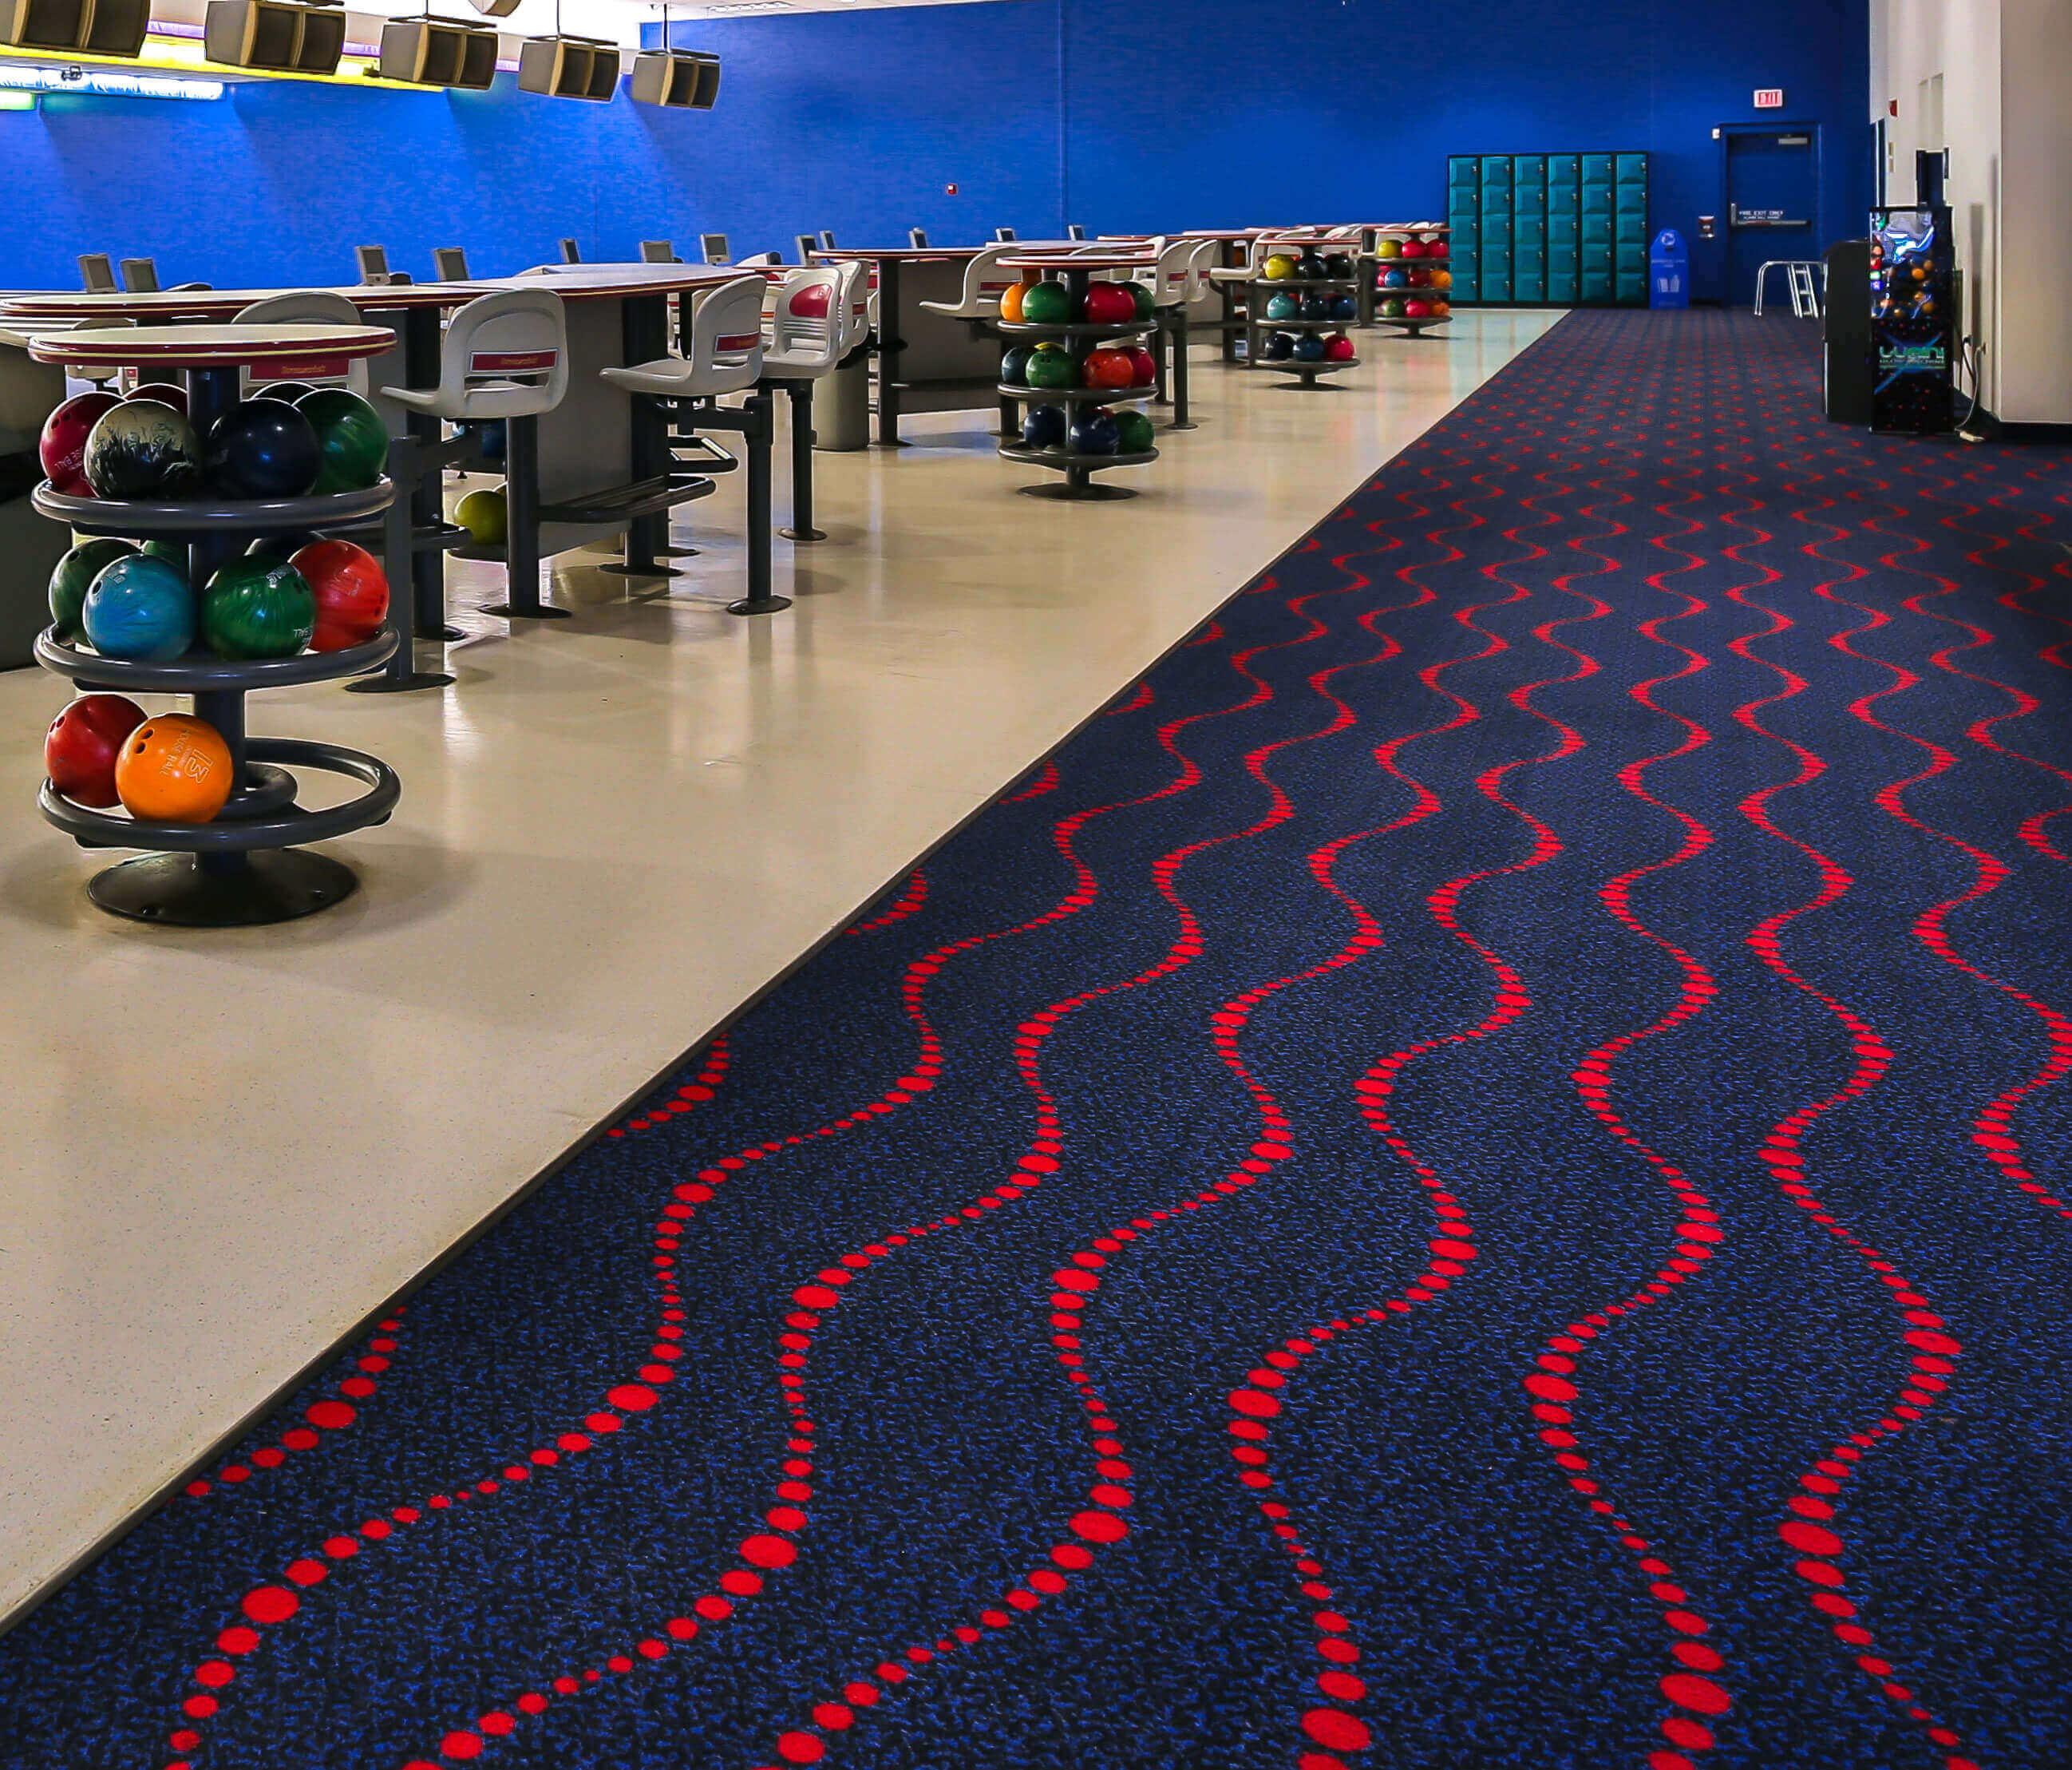 Carpet Tile Image